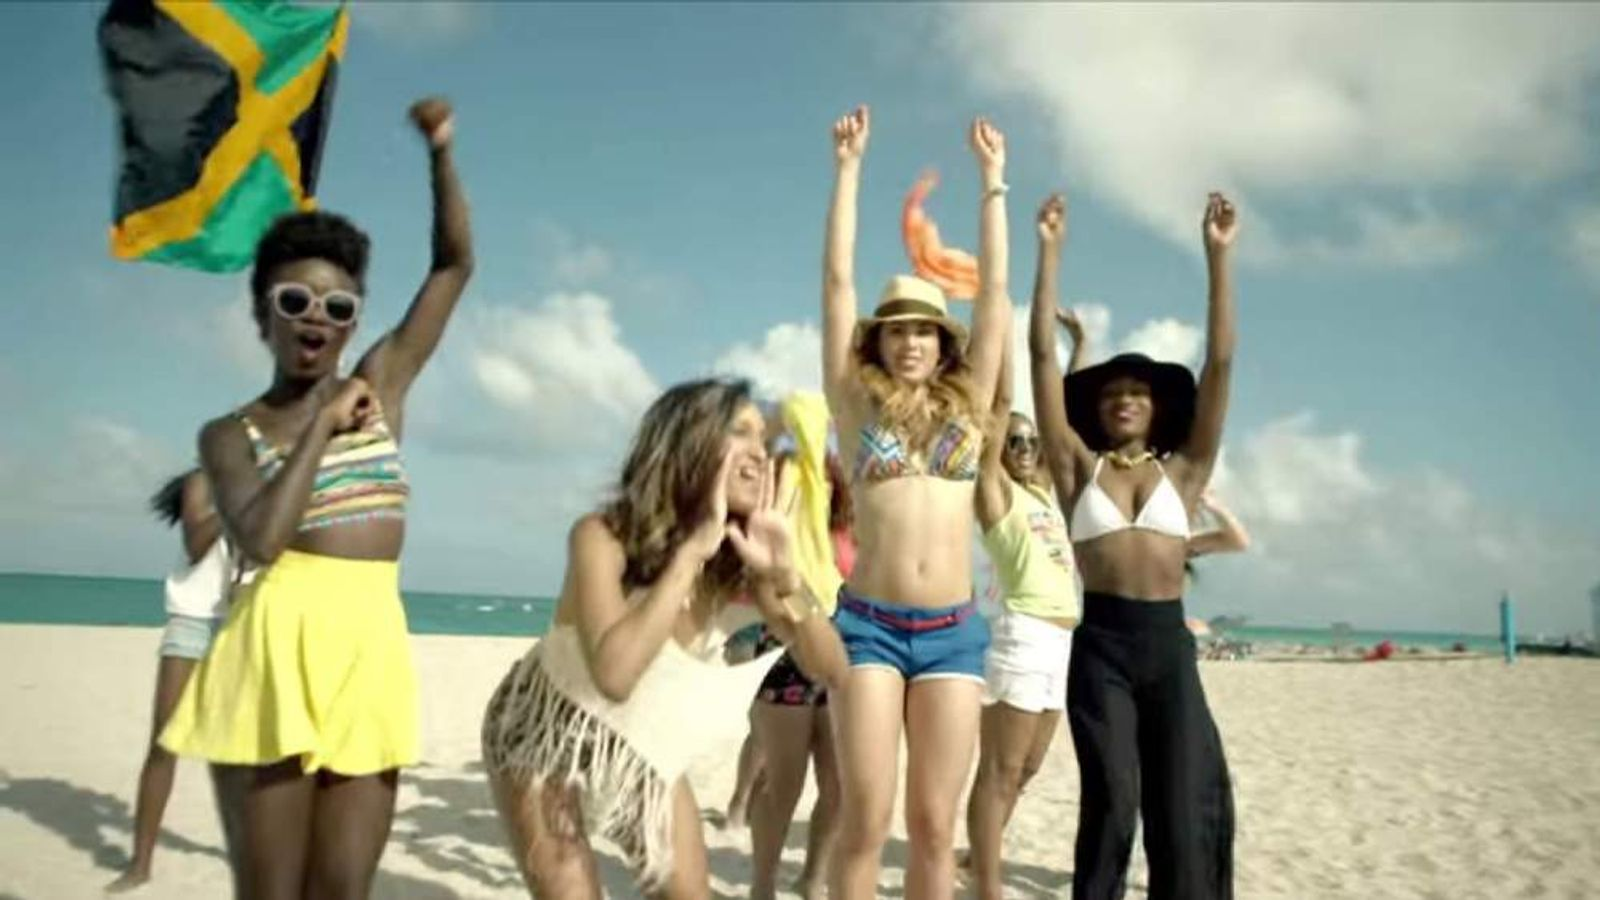 Cheerleader OMI/ULTRA MUSIC